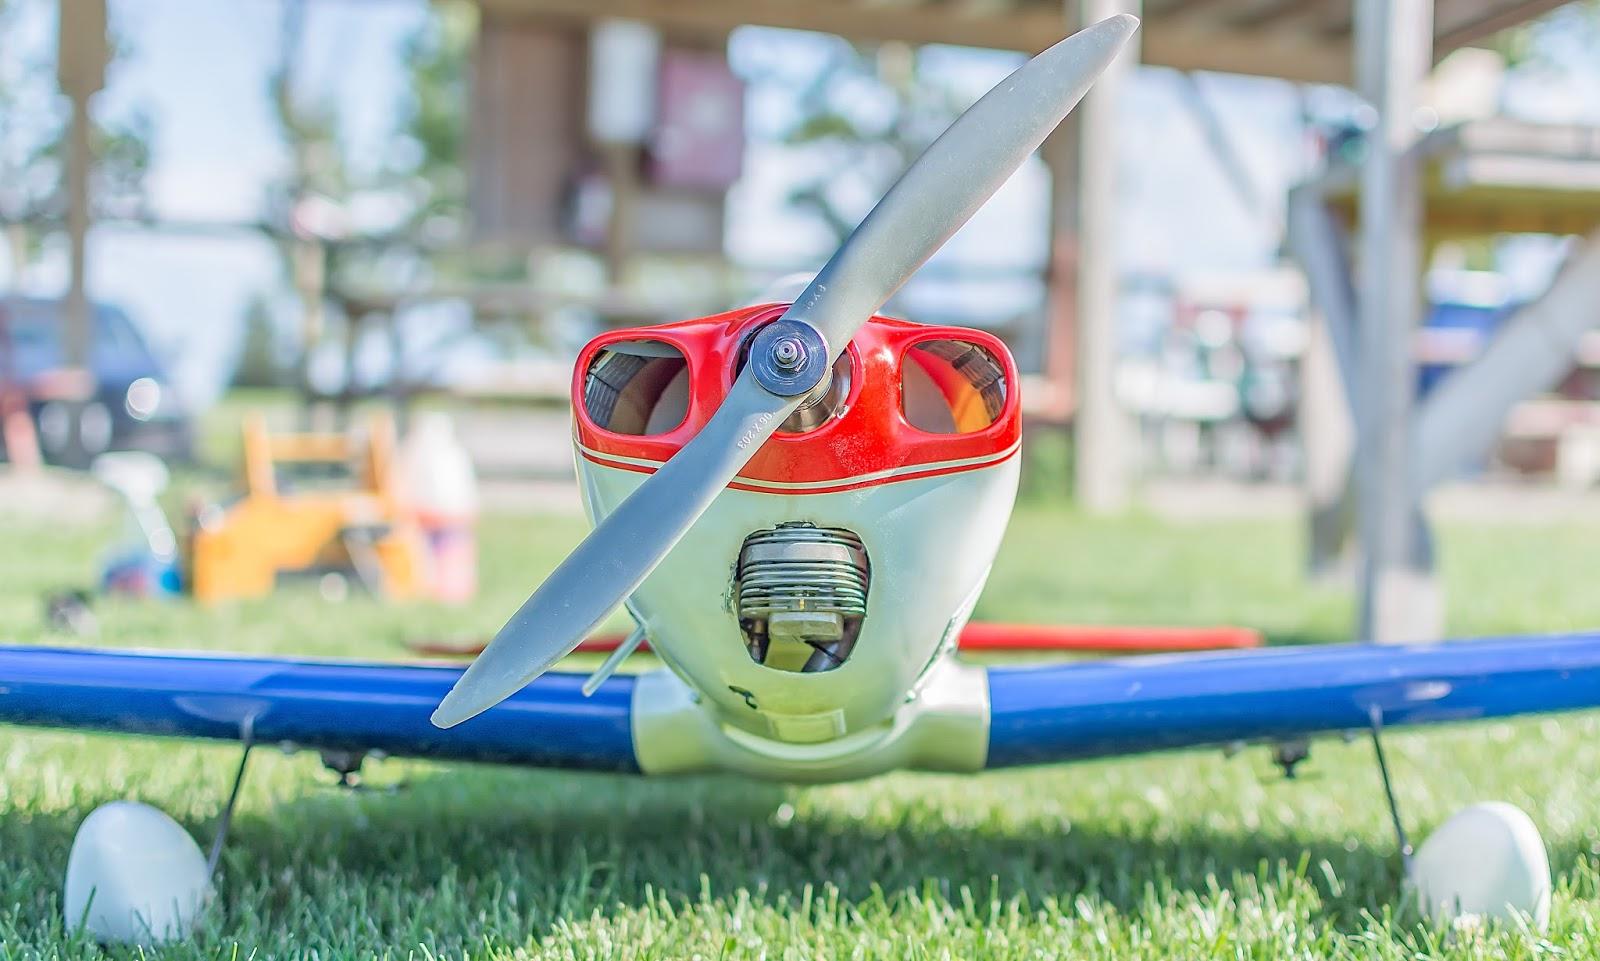 Wells' R/C Airplanes